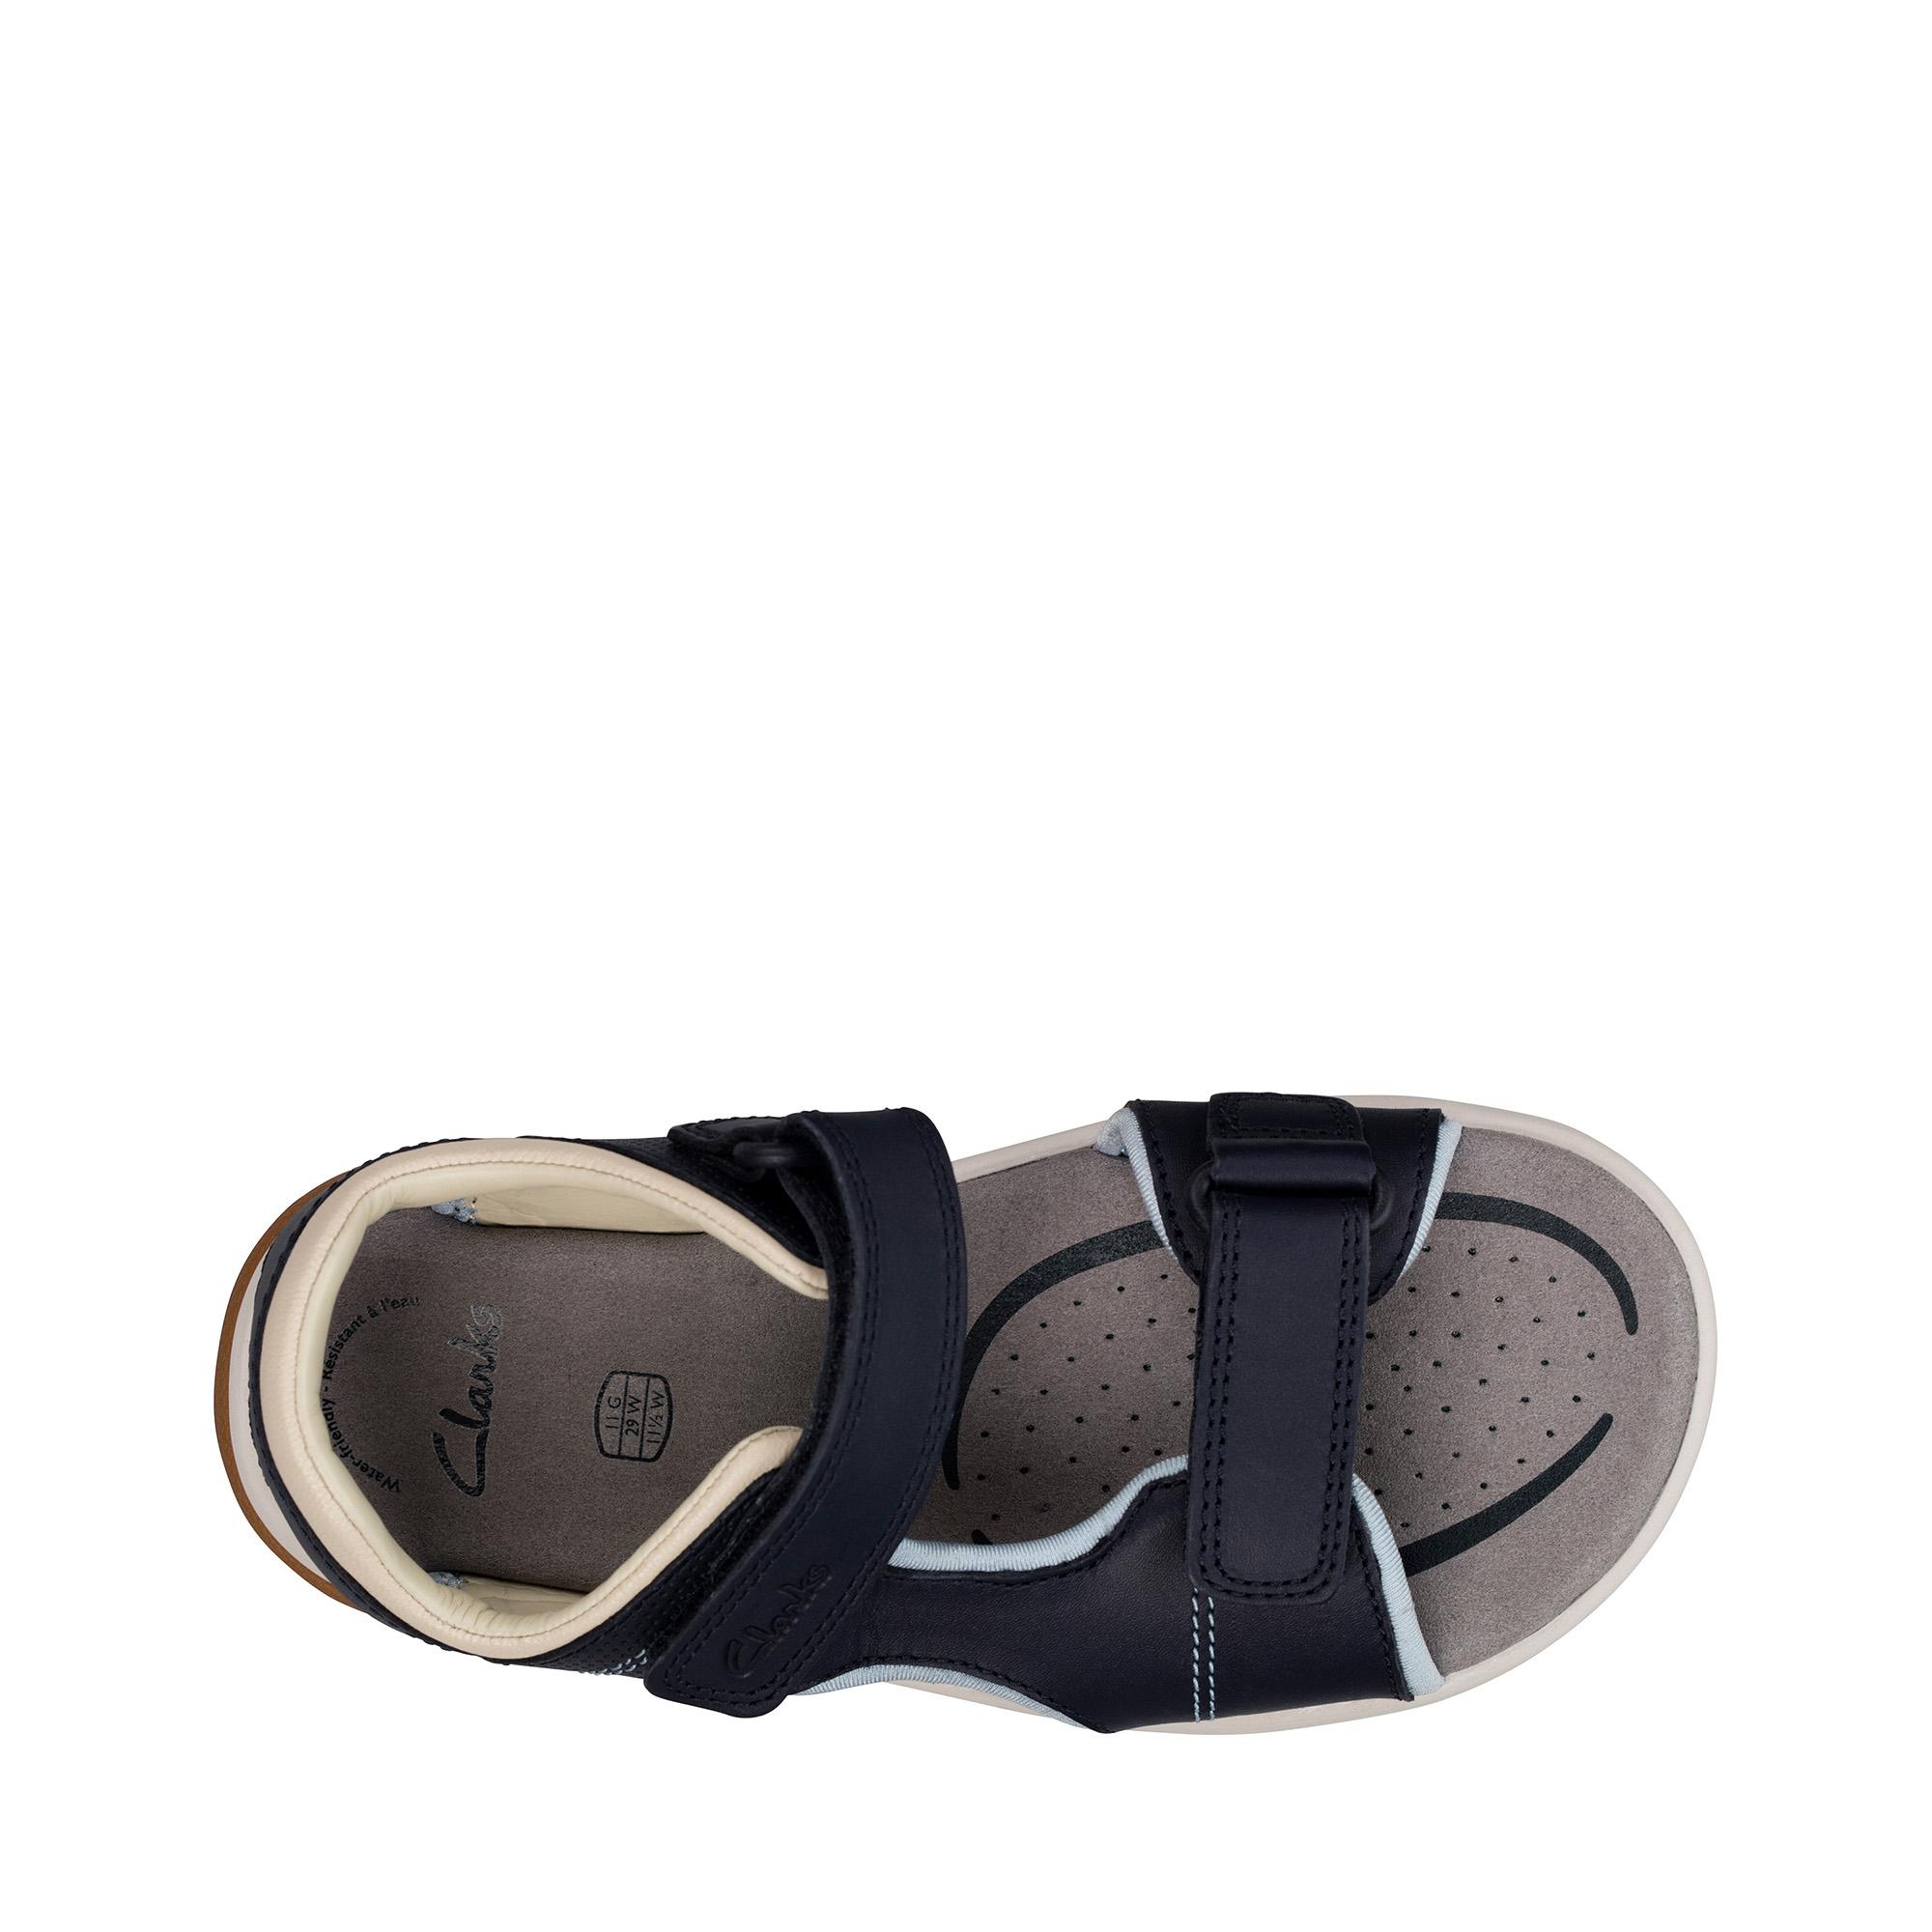 Clarks Garçons Rocco Wave K Bleu Marine Cuir Sandales Taille UK 13 g